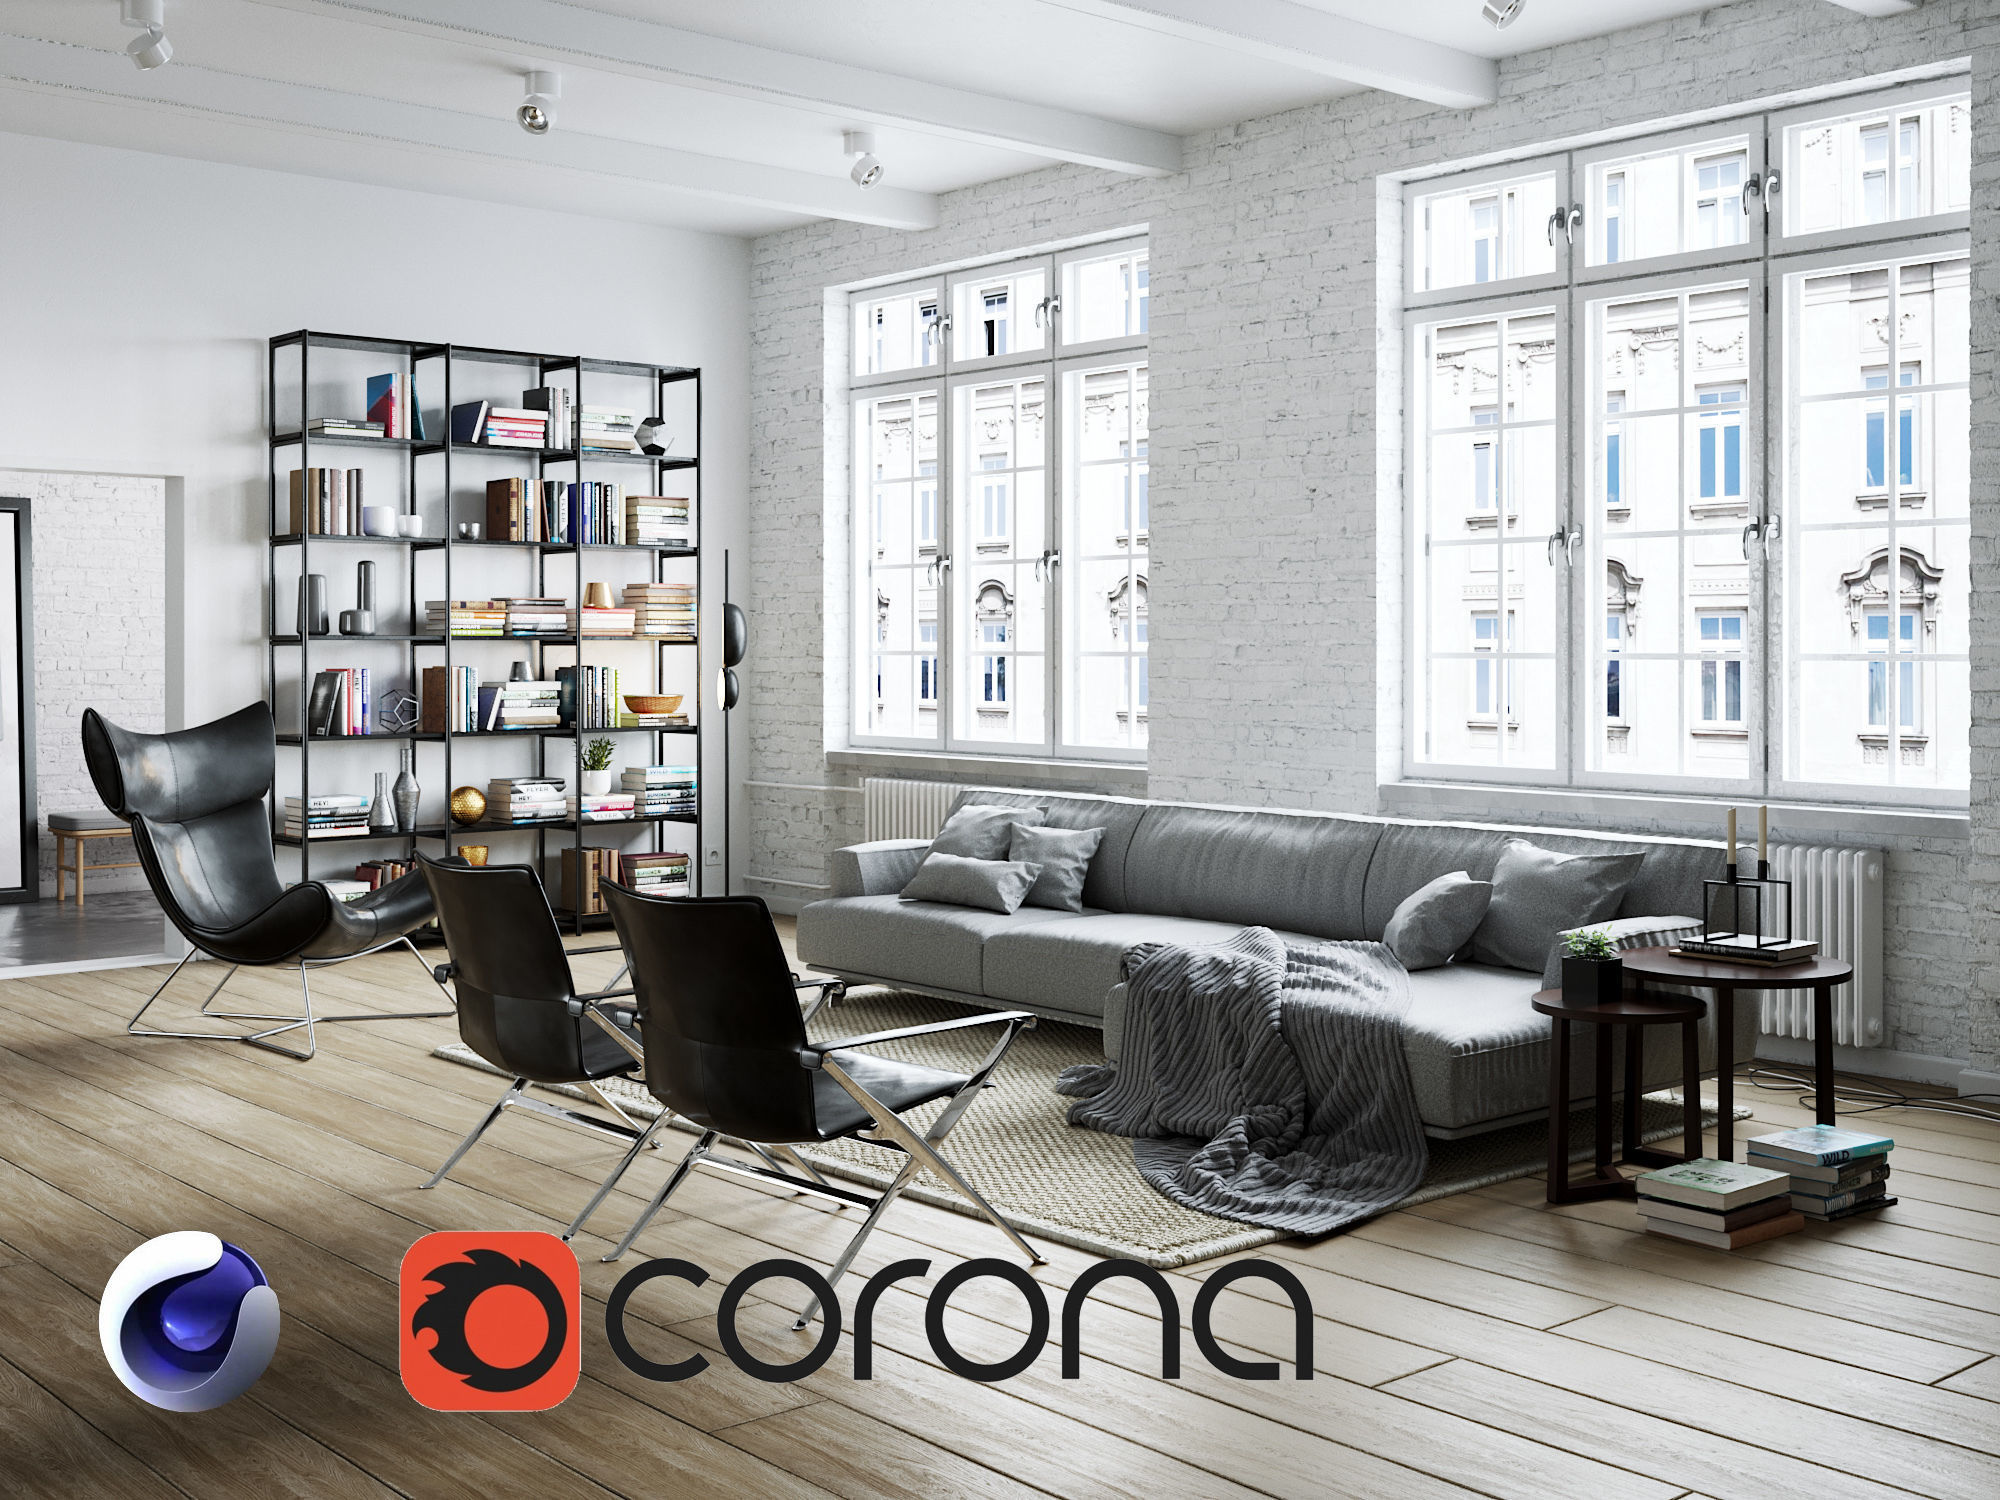 Corona C4d Download